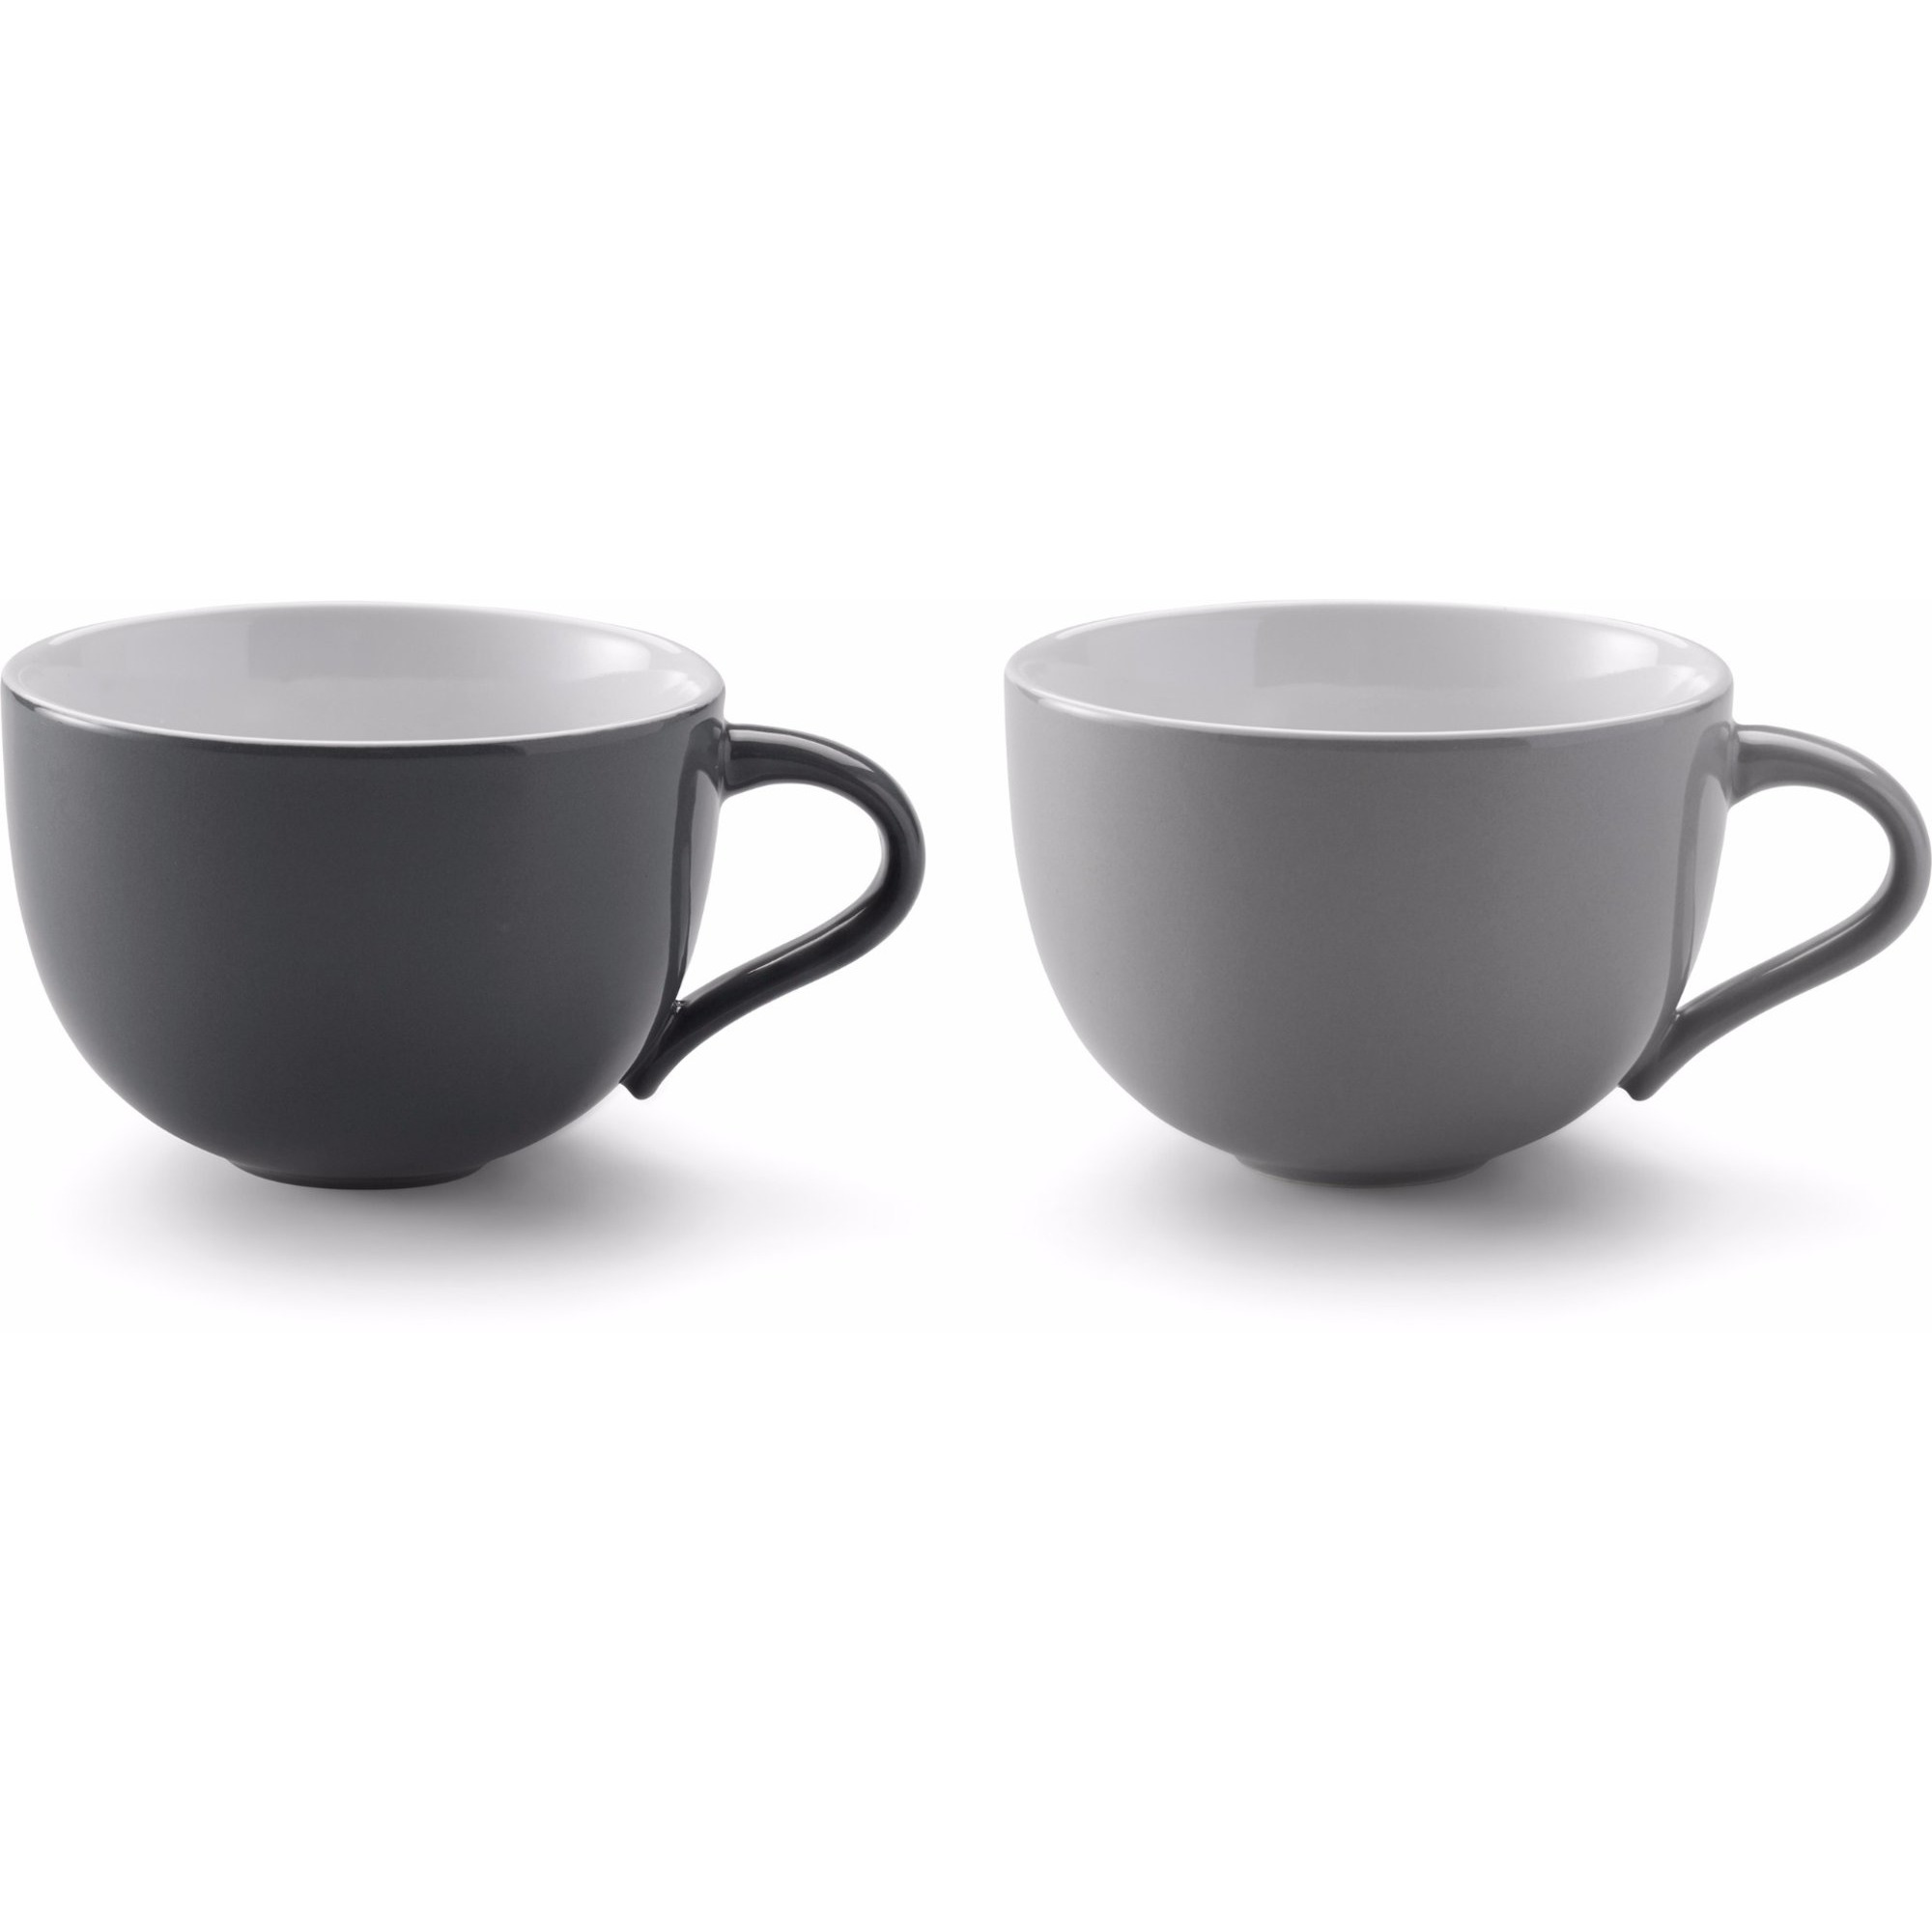 Stelton Emma kopp 2 st – grå